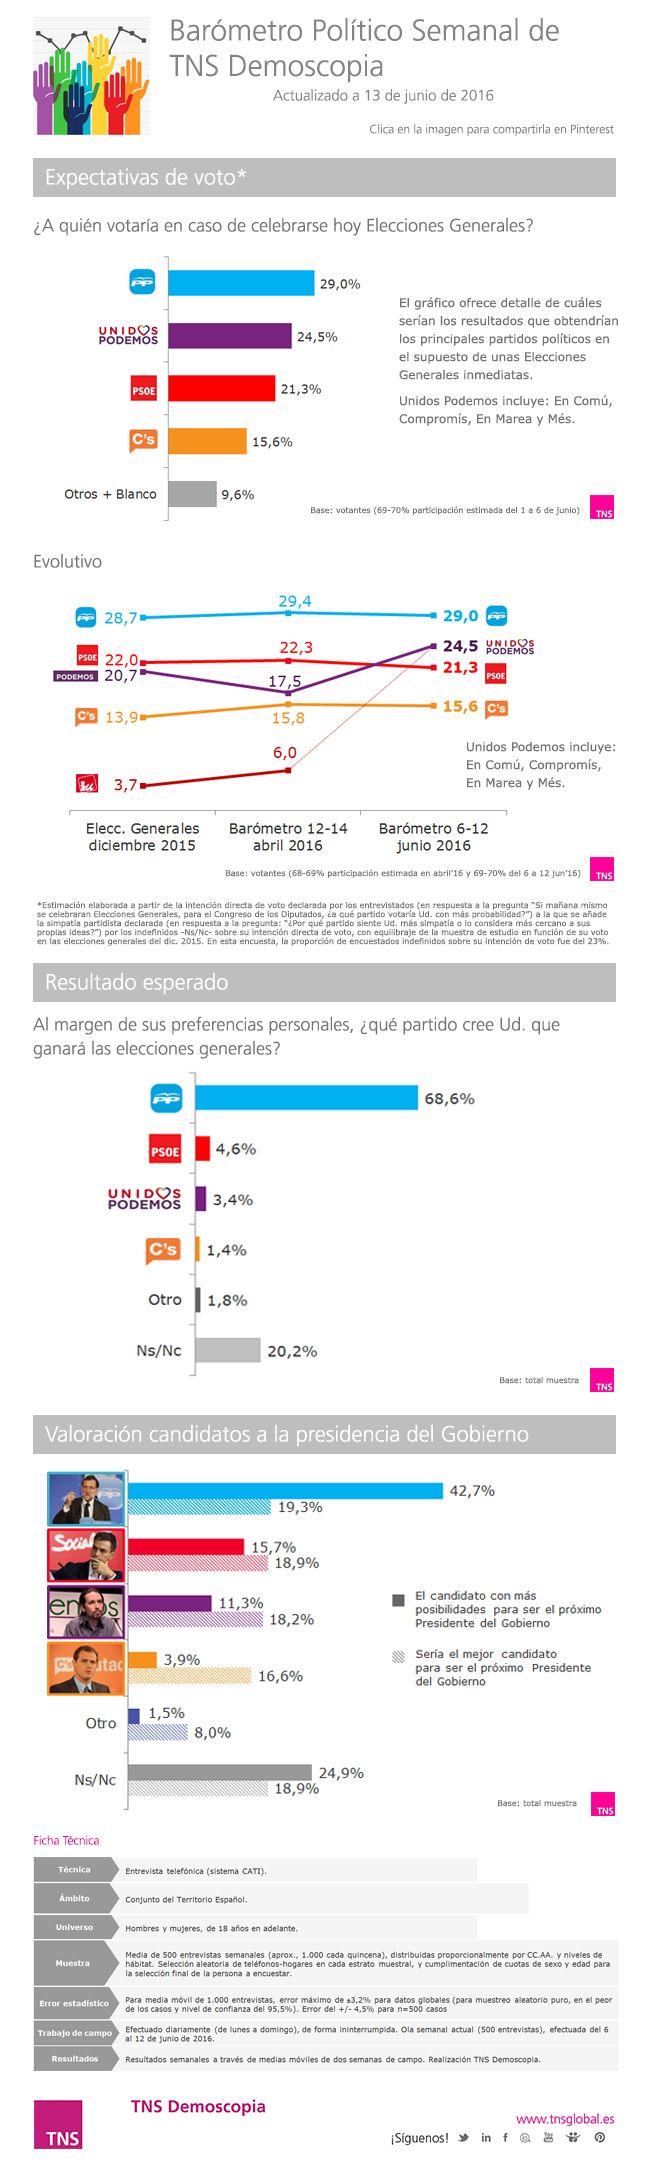 Barómetro Político Semanal 13 de junio de 2016